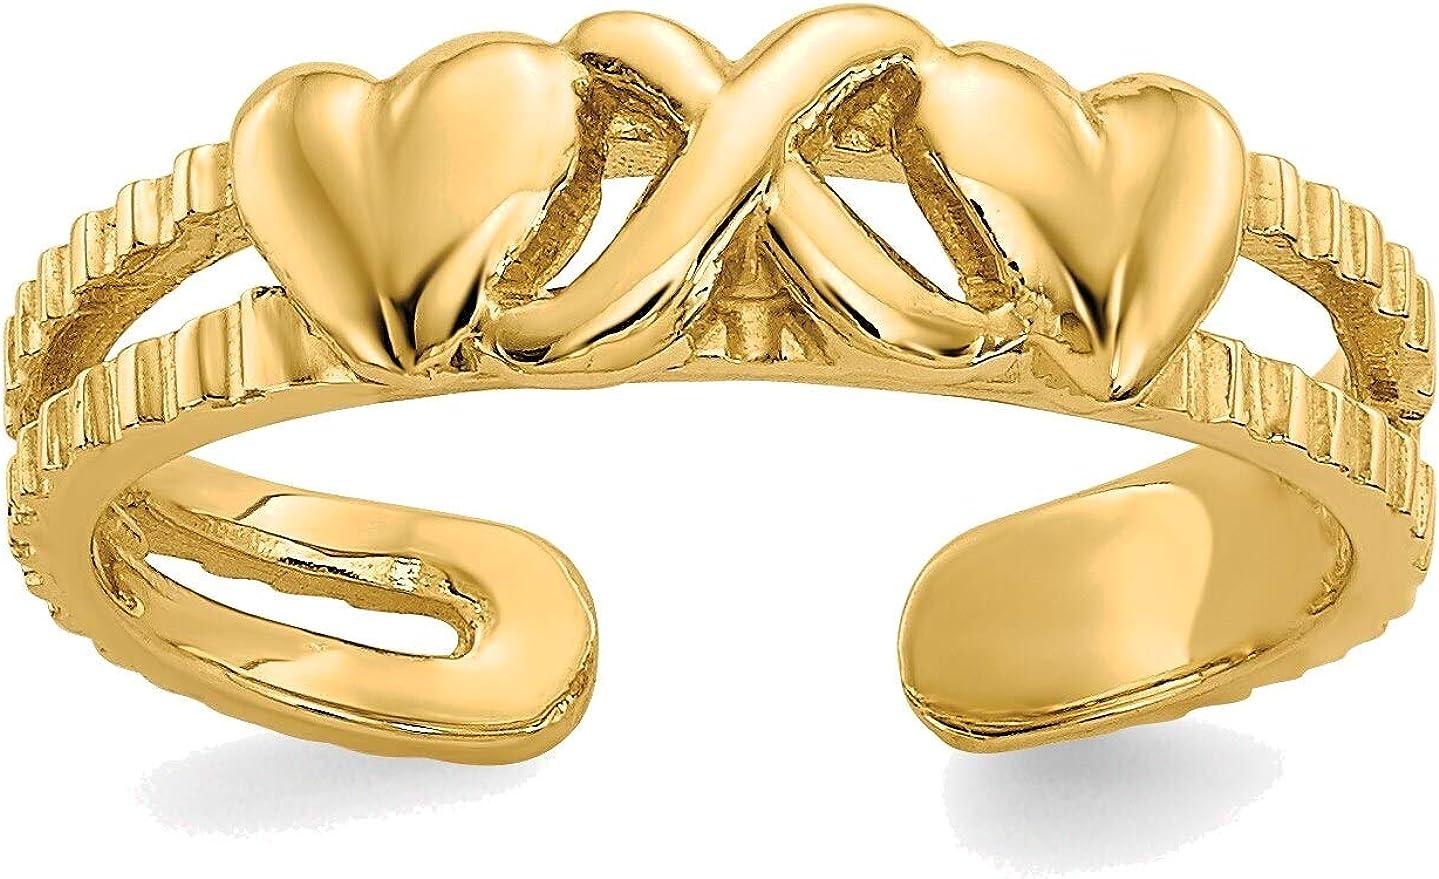 Bonyak Jewelry Hearts & X Toe Ring in 14K Yellow Gold in Size 11